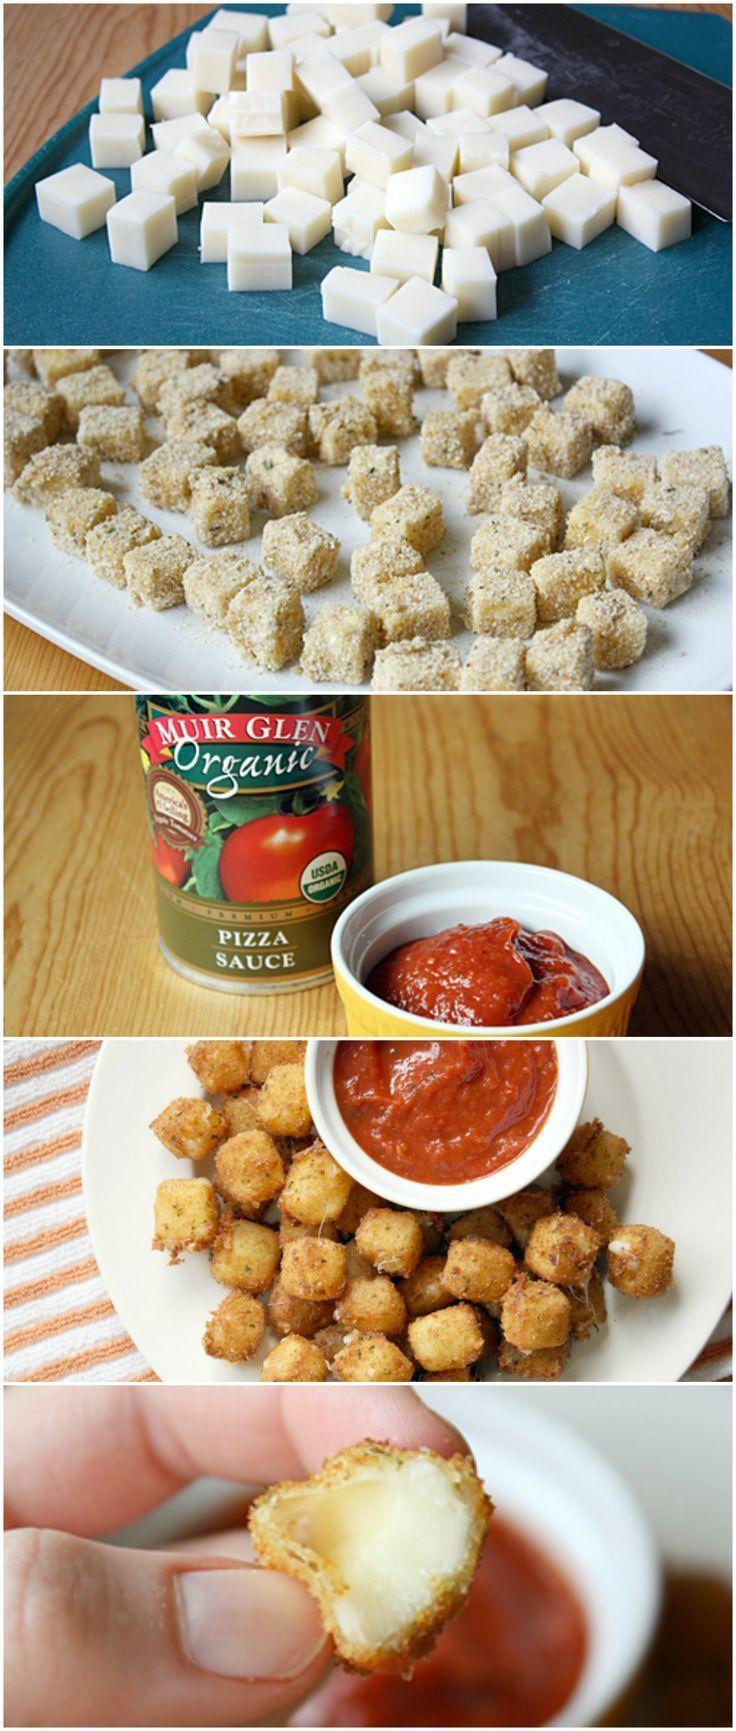 25+ best ideas about Homemade mozzarella sticks on ...